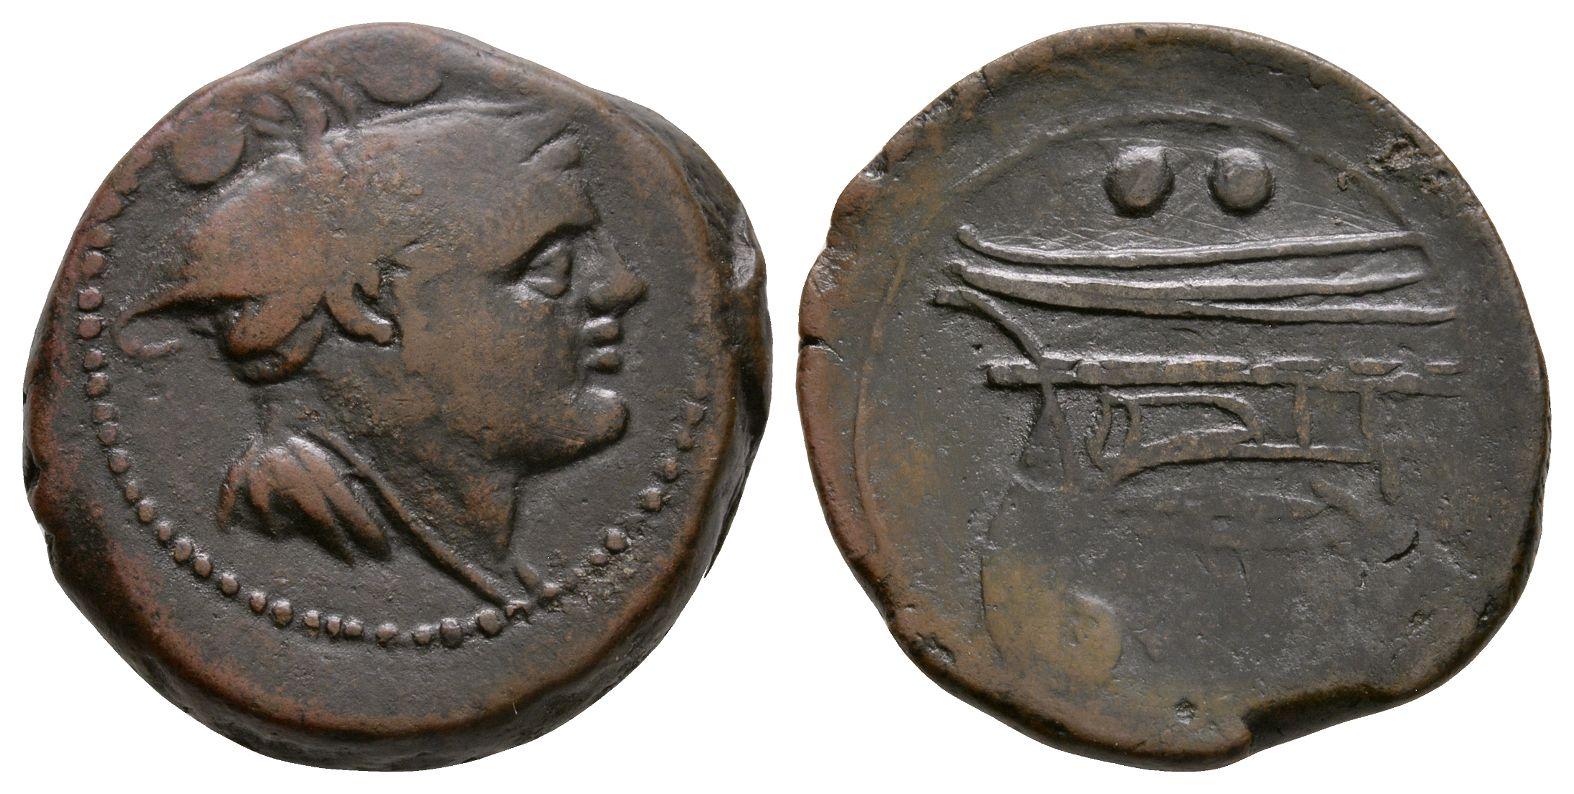 Ancient Roman Republican Coins - Post Reform - Galley Sextans